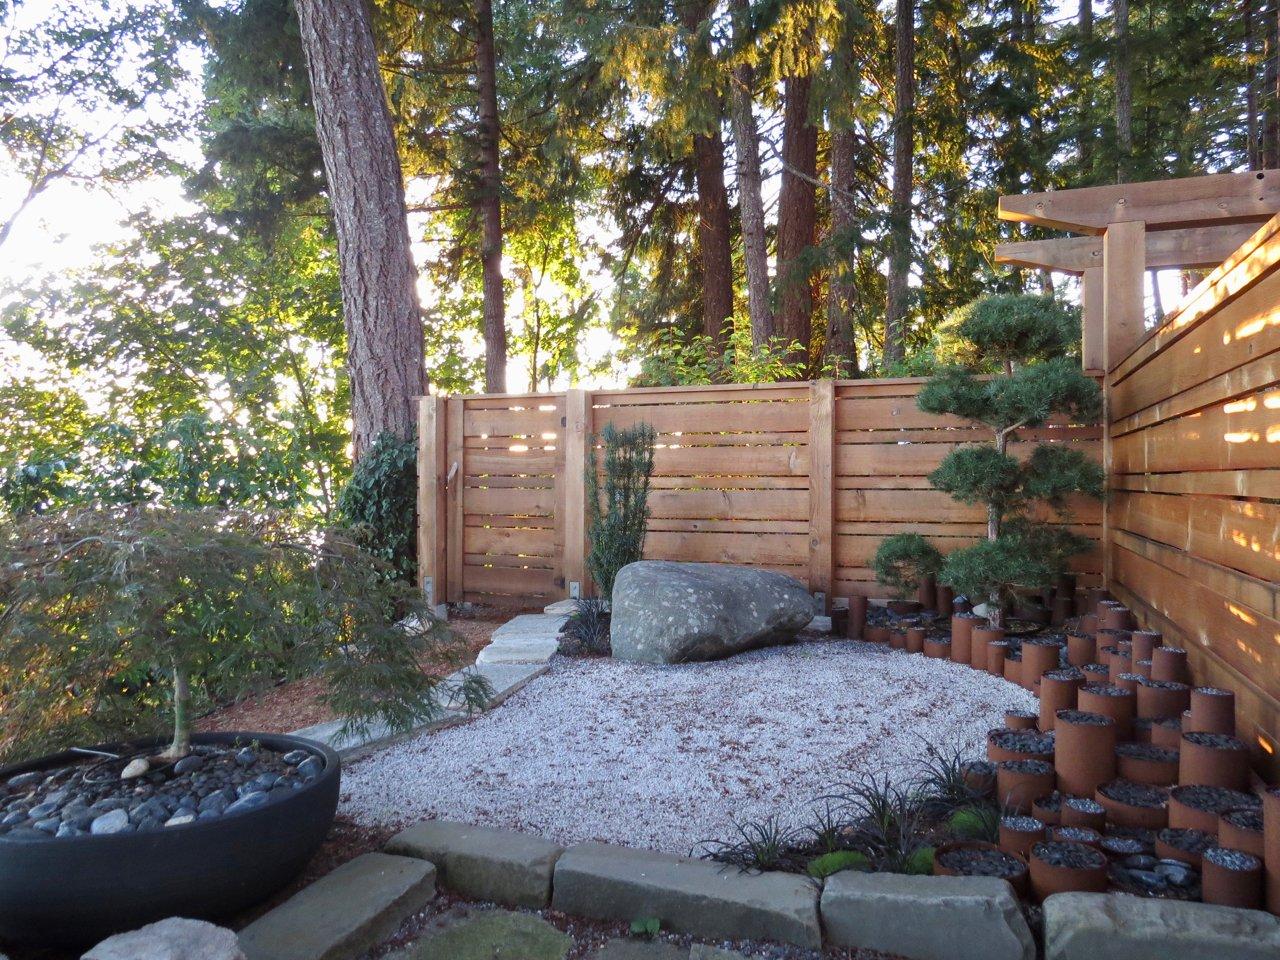 Outdoor, Side Yard, Trees, Shrubs, Grass, Gardens, and Boulders Zen Garden  Cortes Island Custom Blu Prefab by Mark Spevakow